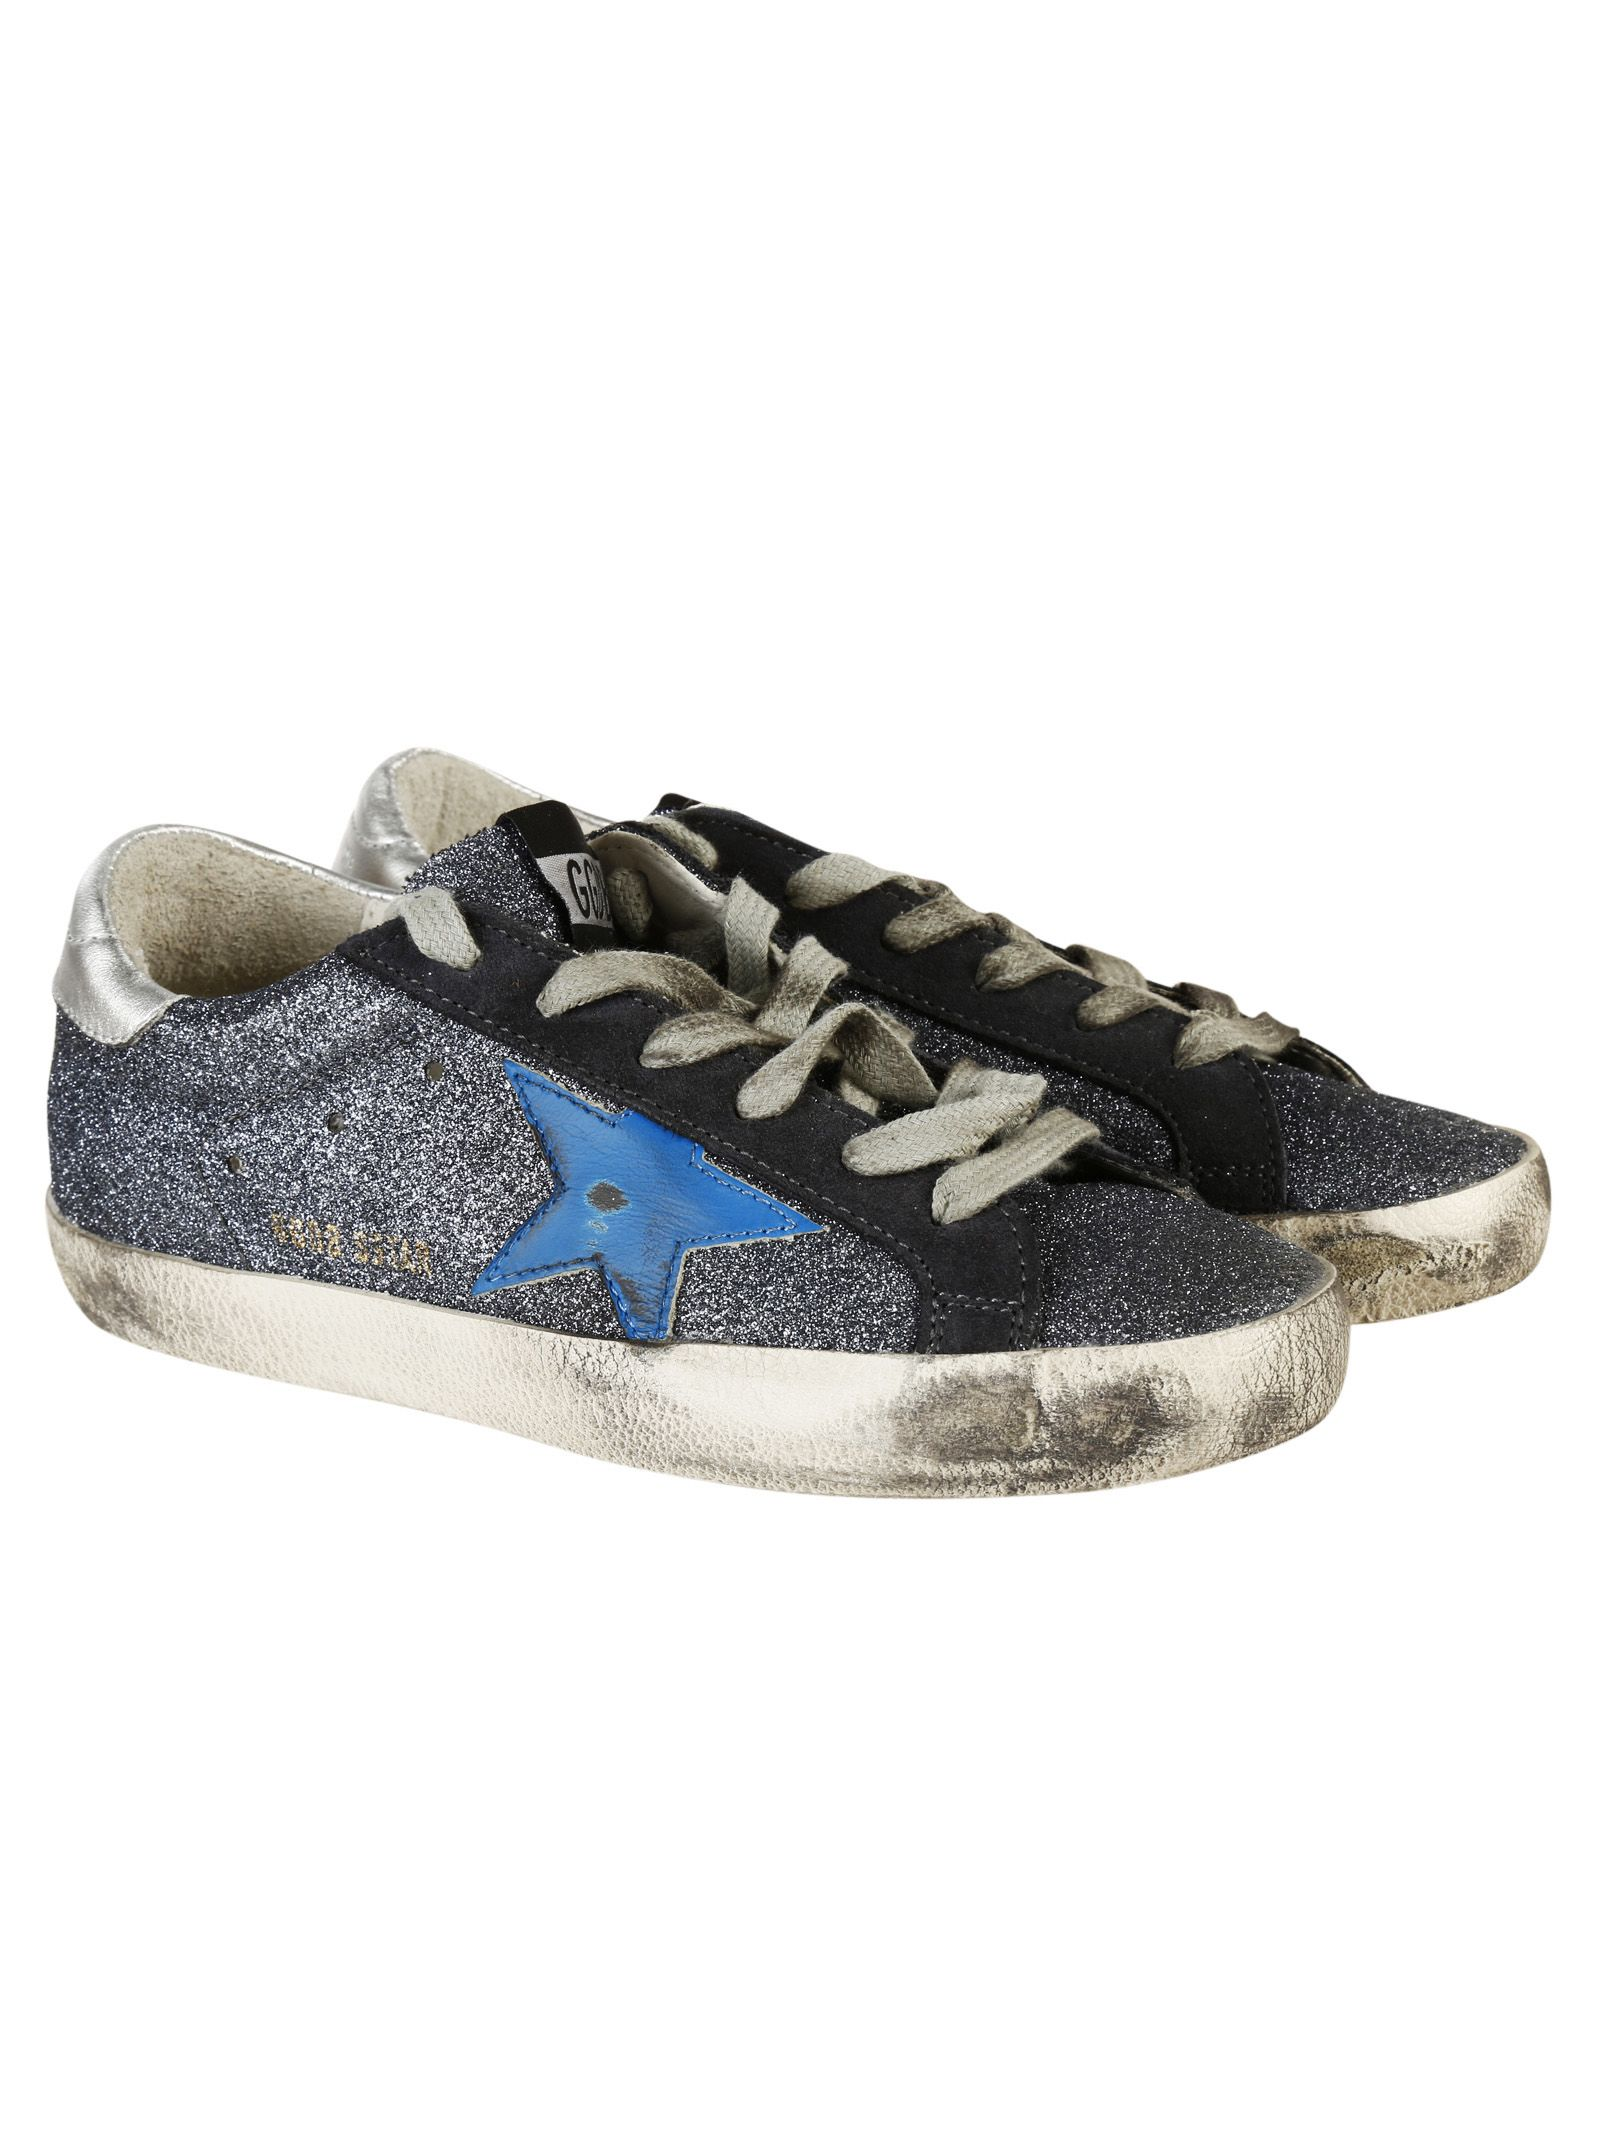 golden goose golden goose super star sneakers blue women 39 s sneakers italist. Black Bedroom Furniture Sets. Home Design Ideas